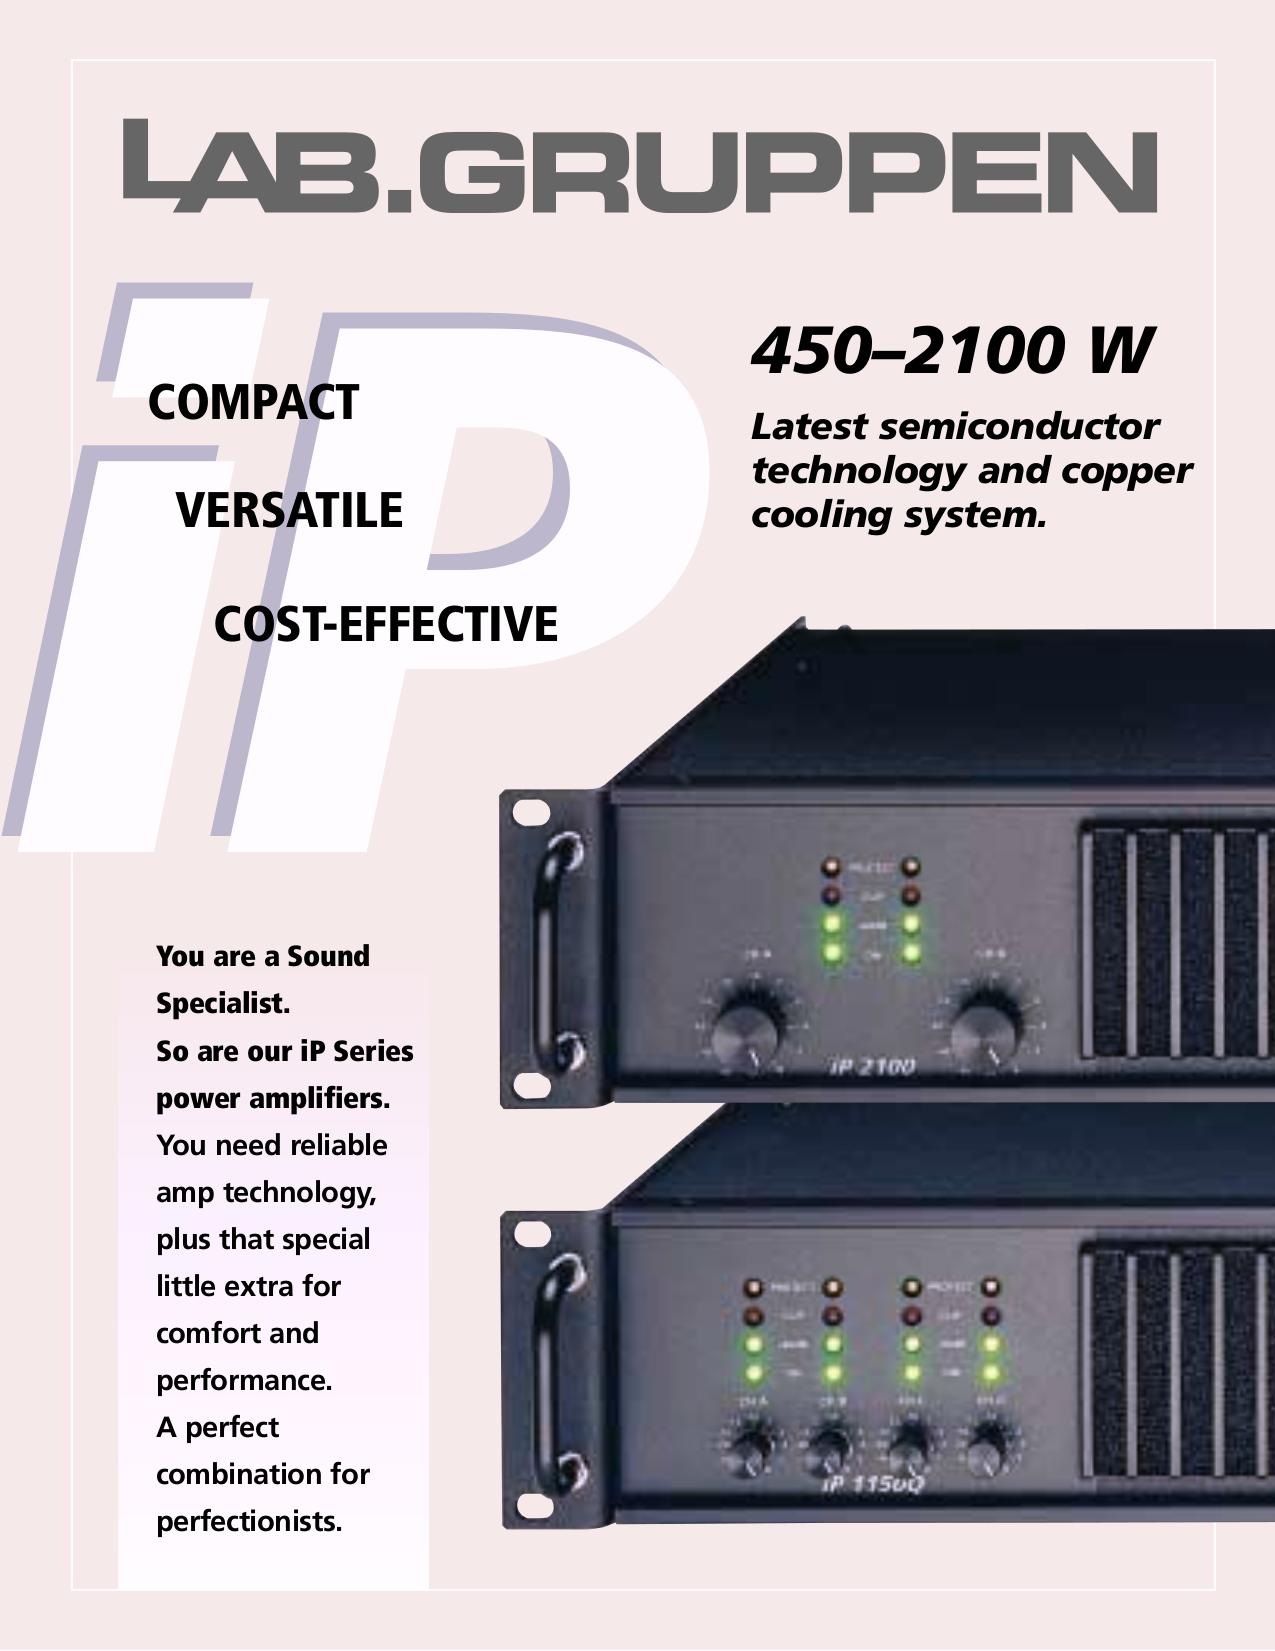 pdf for Lab.gruppen Amp fP Series FP 1150Q manual